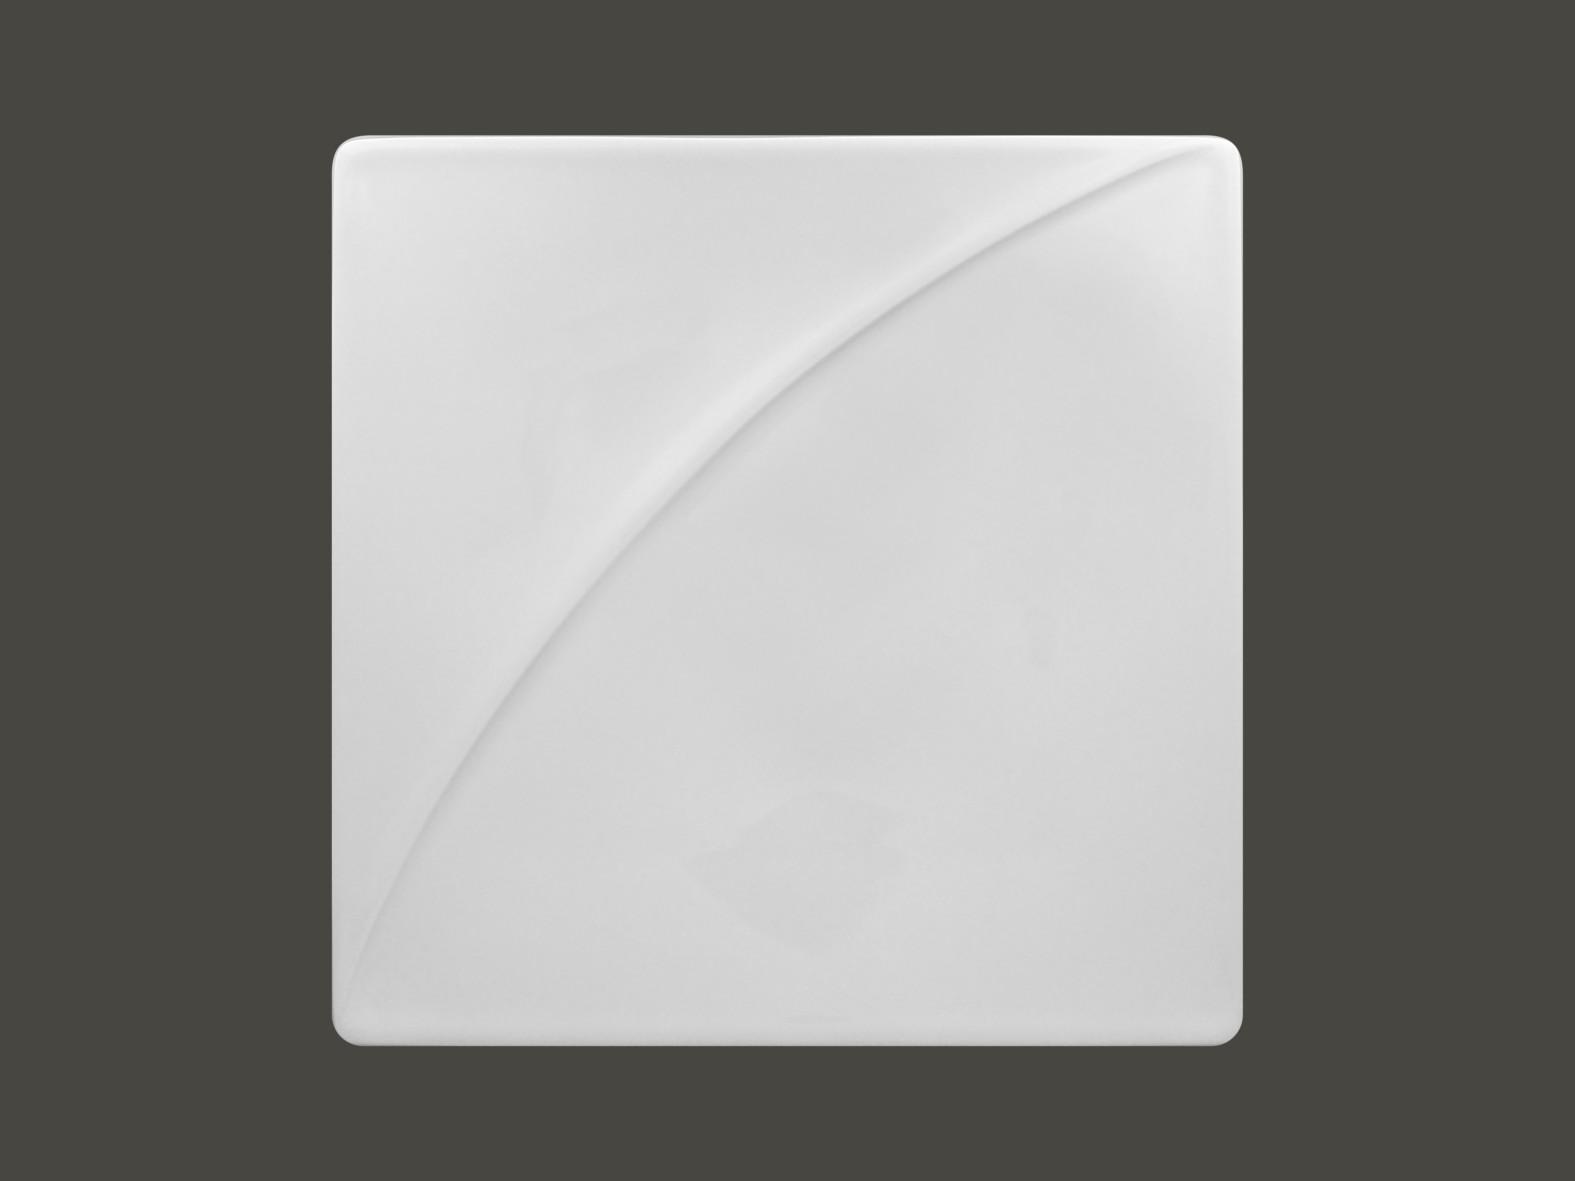 Moon talíř čtvercový 27×27 cm